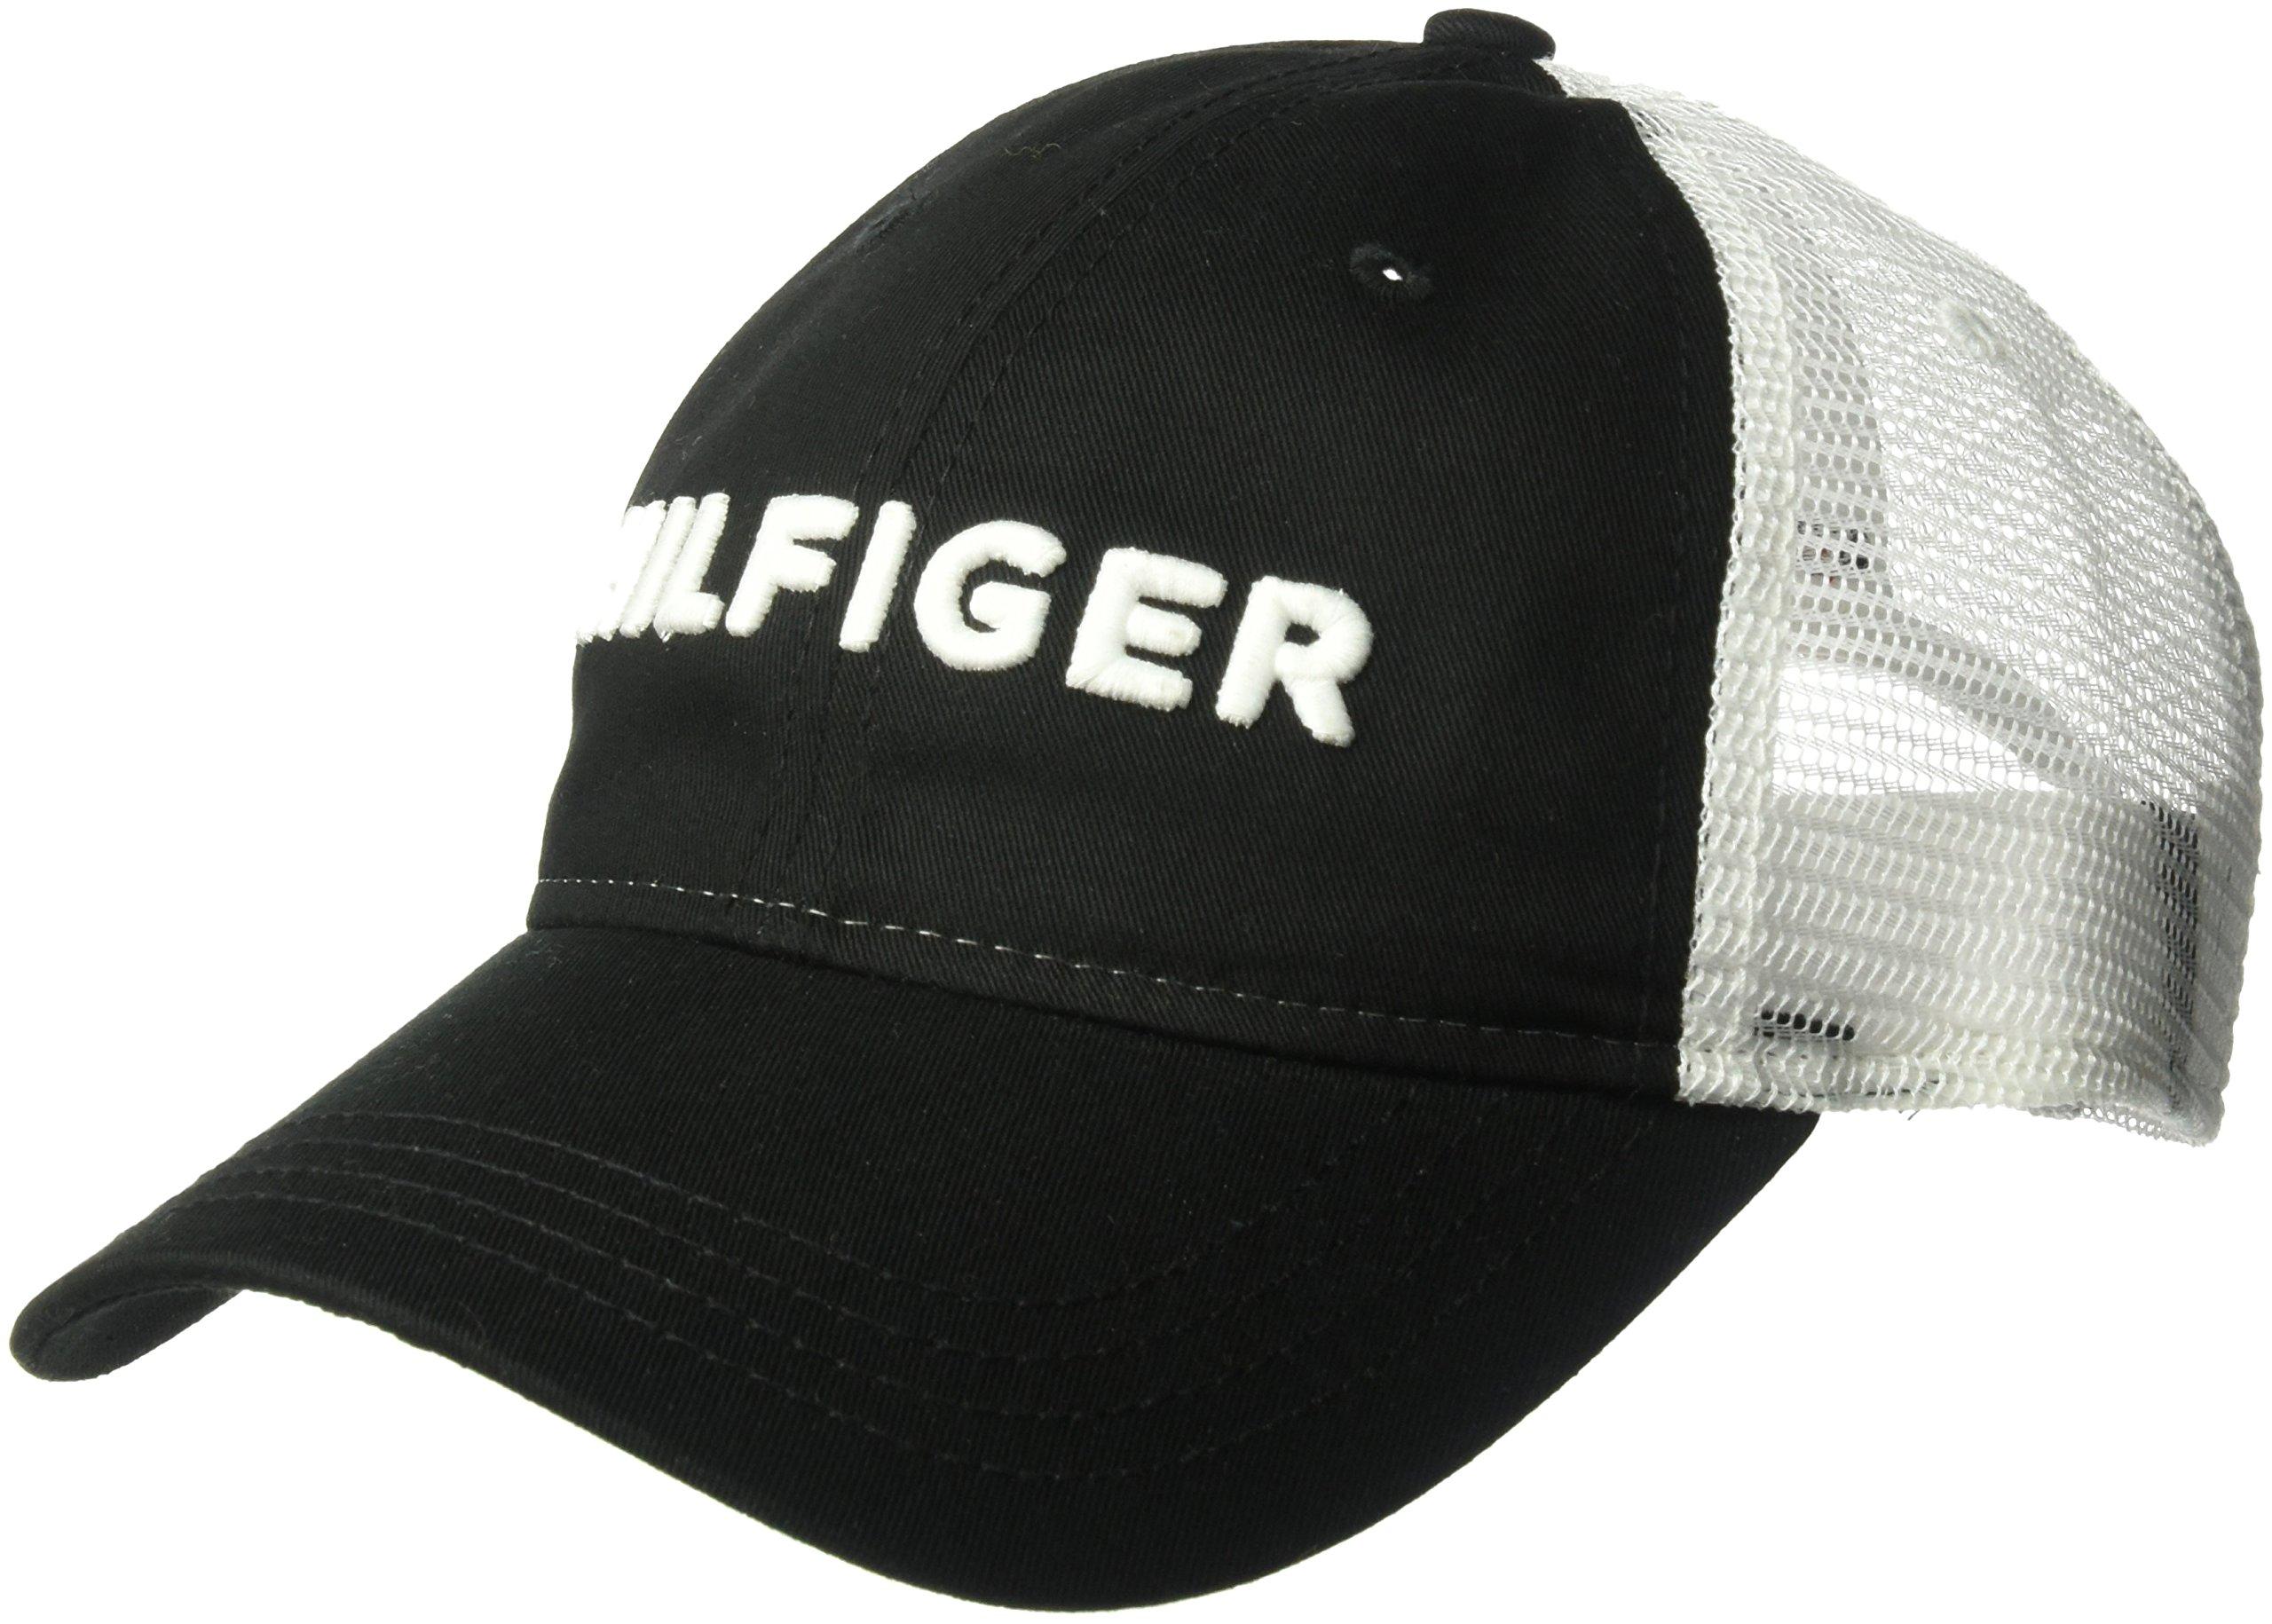 d7c48dcf Galleon - Tommy Hilfiger Men's Dad Hat Hilfiger Trucker Cap, Black O/S